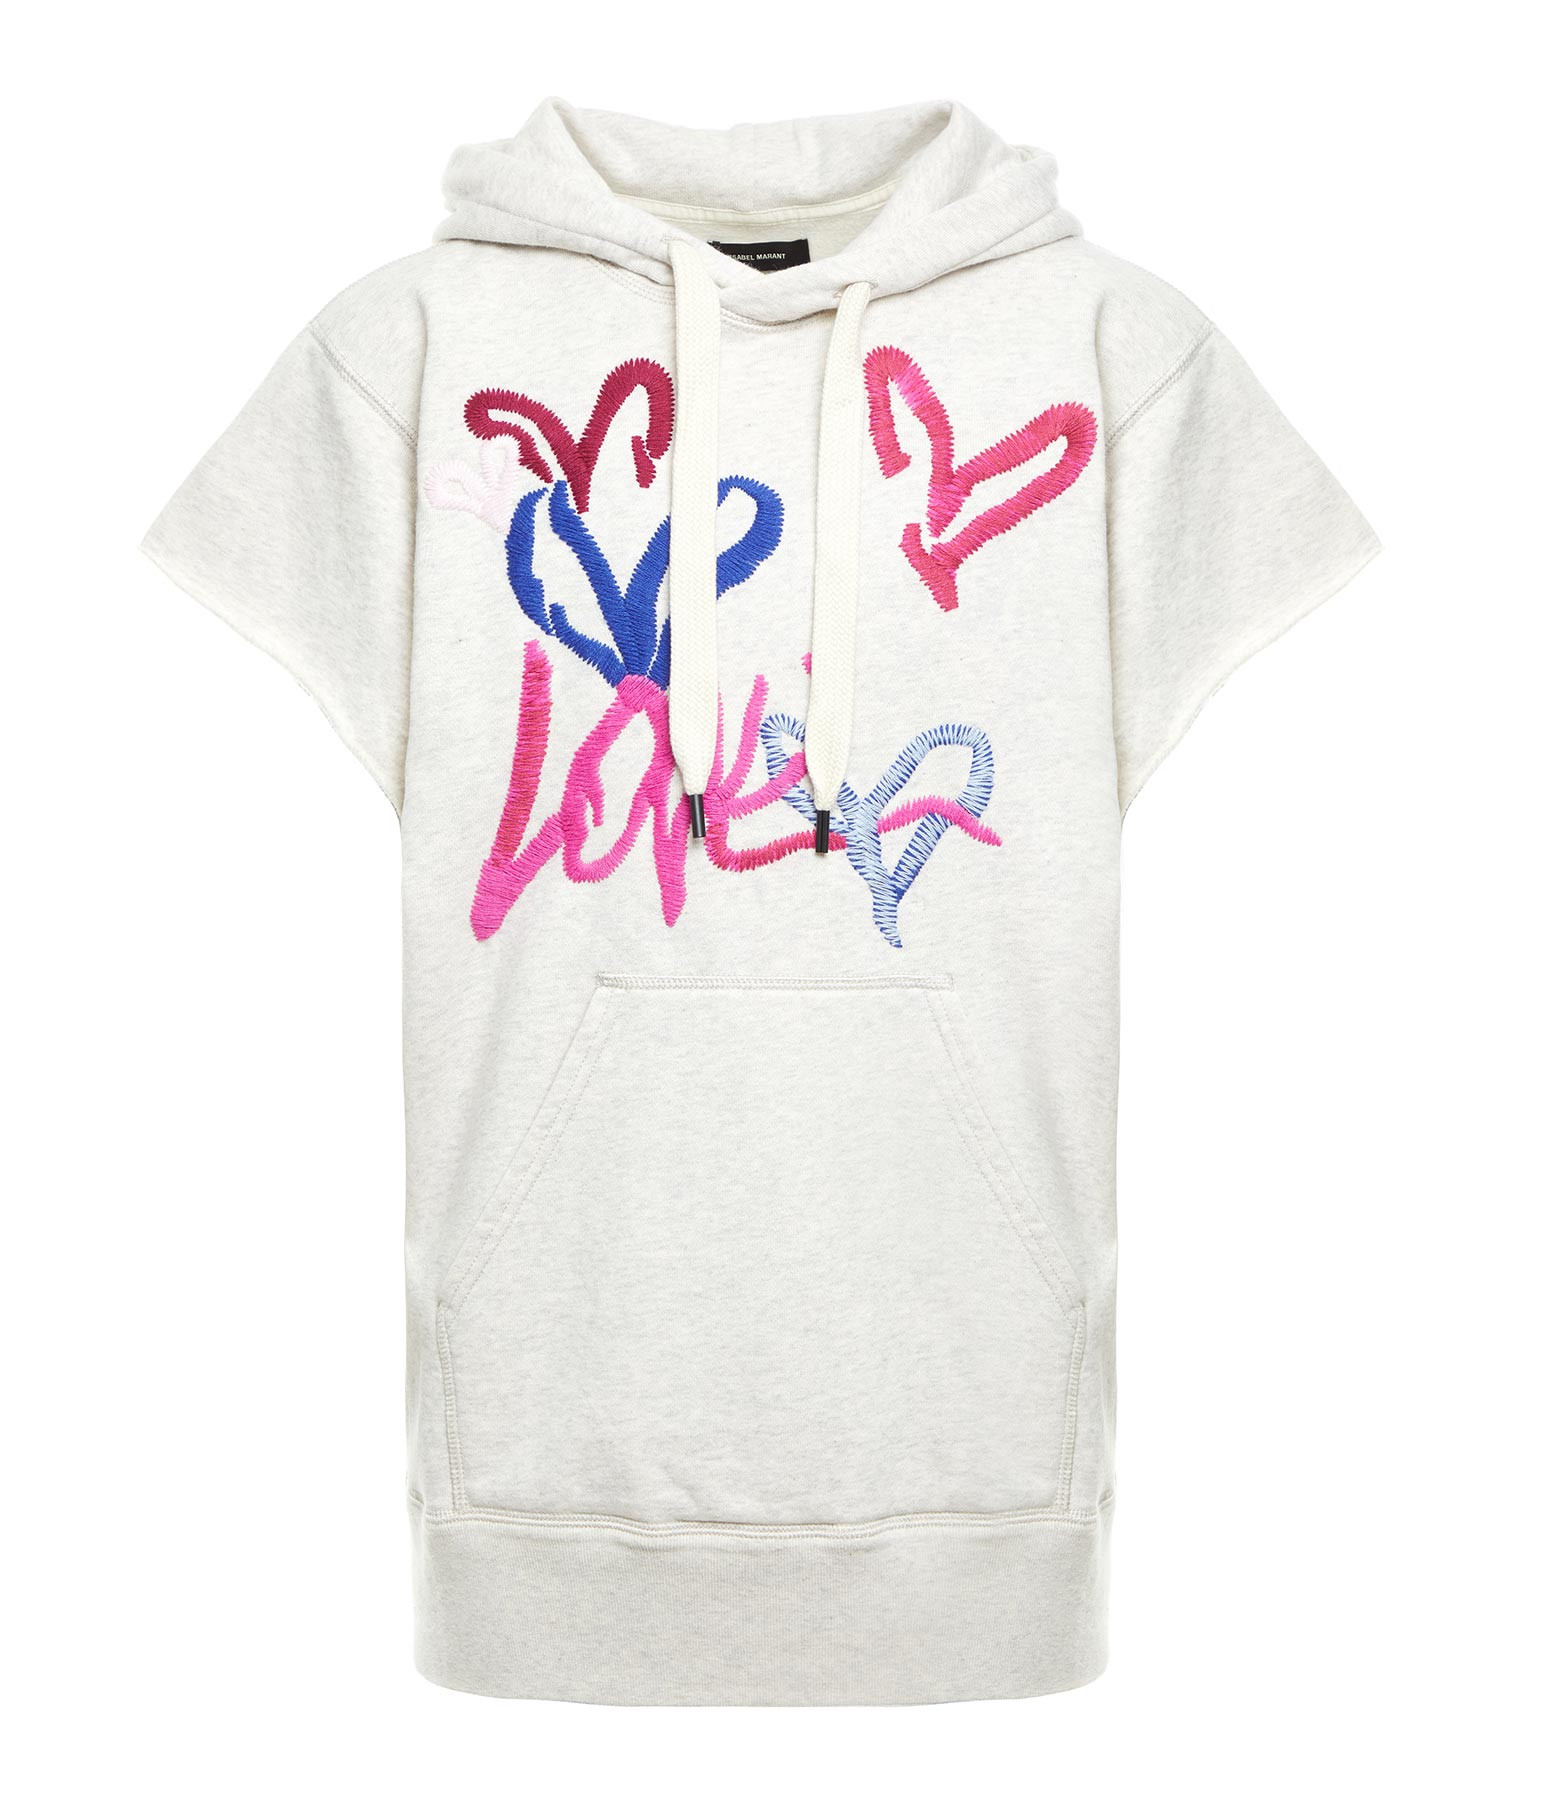 ISABEL MARANT - Sweatshirt Miami Coton Écru